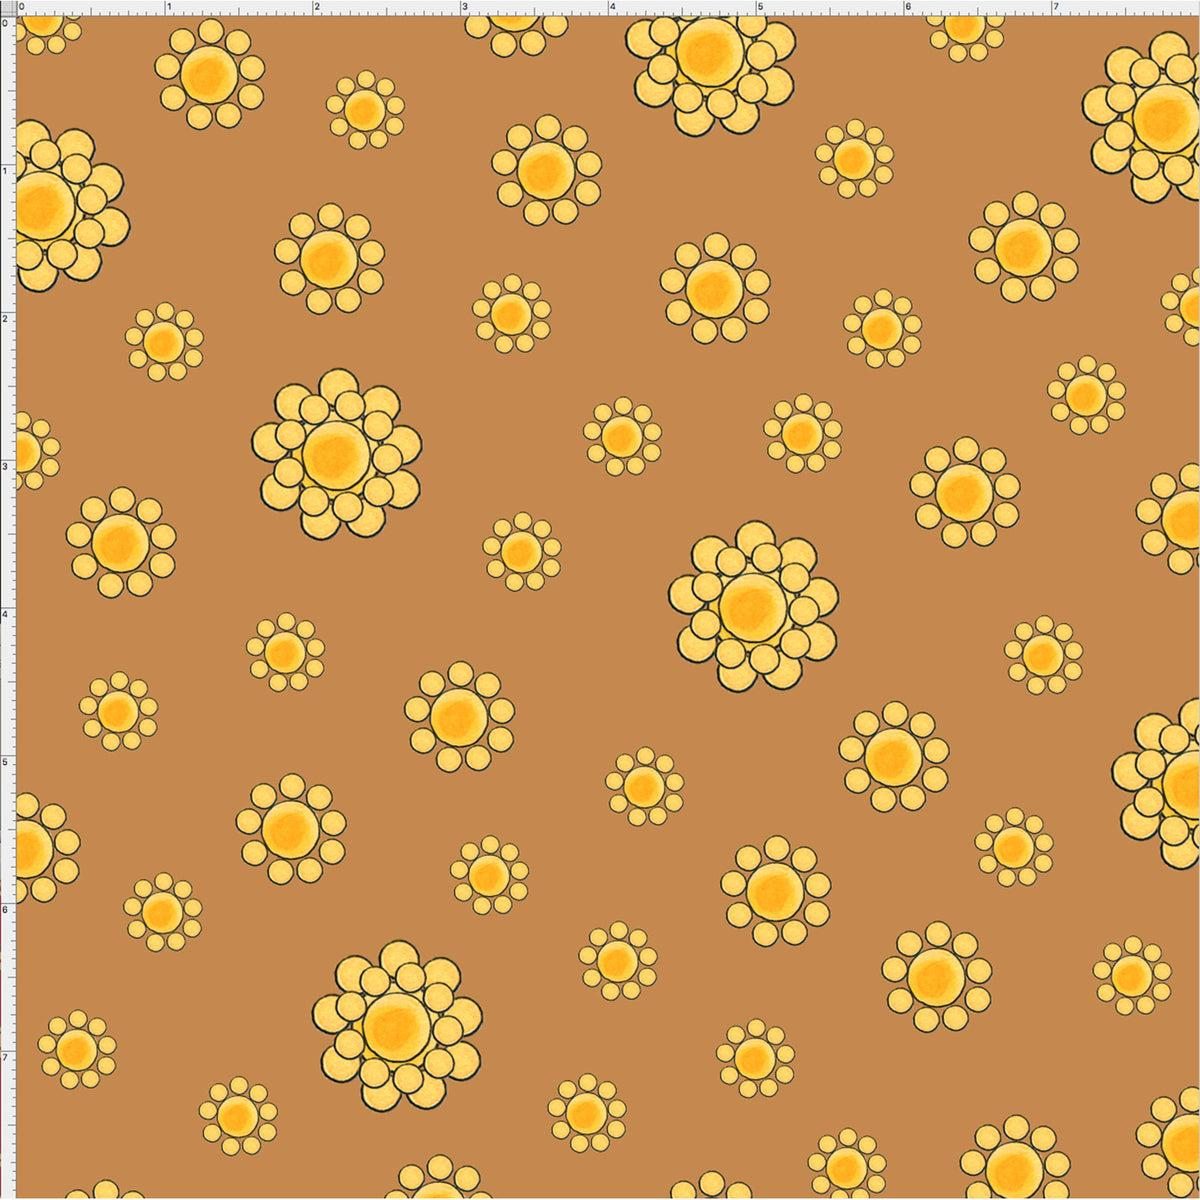 Bandana Dots - Tan<br>692-322